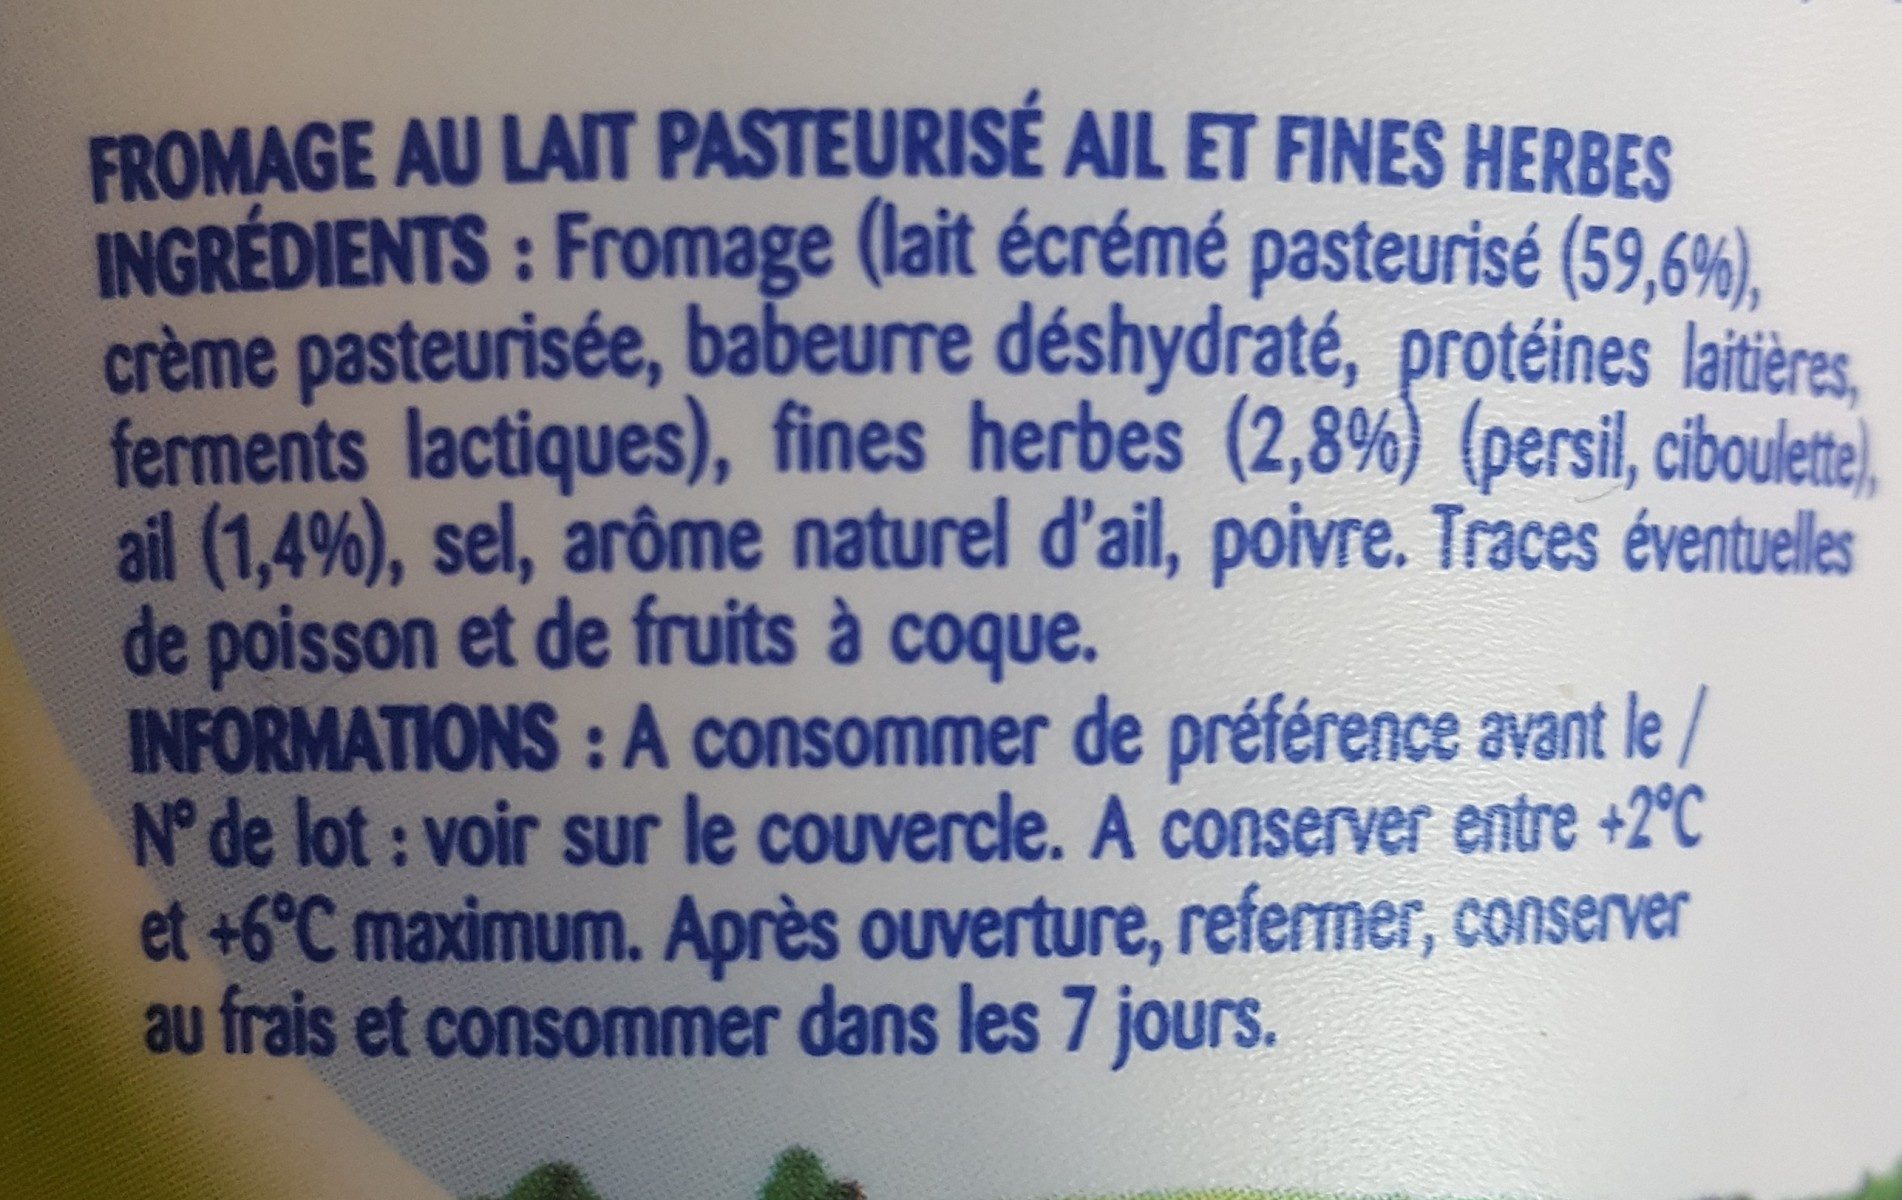 Pâturages Printendre ail et fines herbes - Ingredients